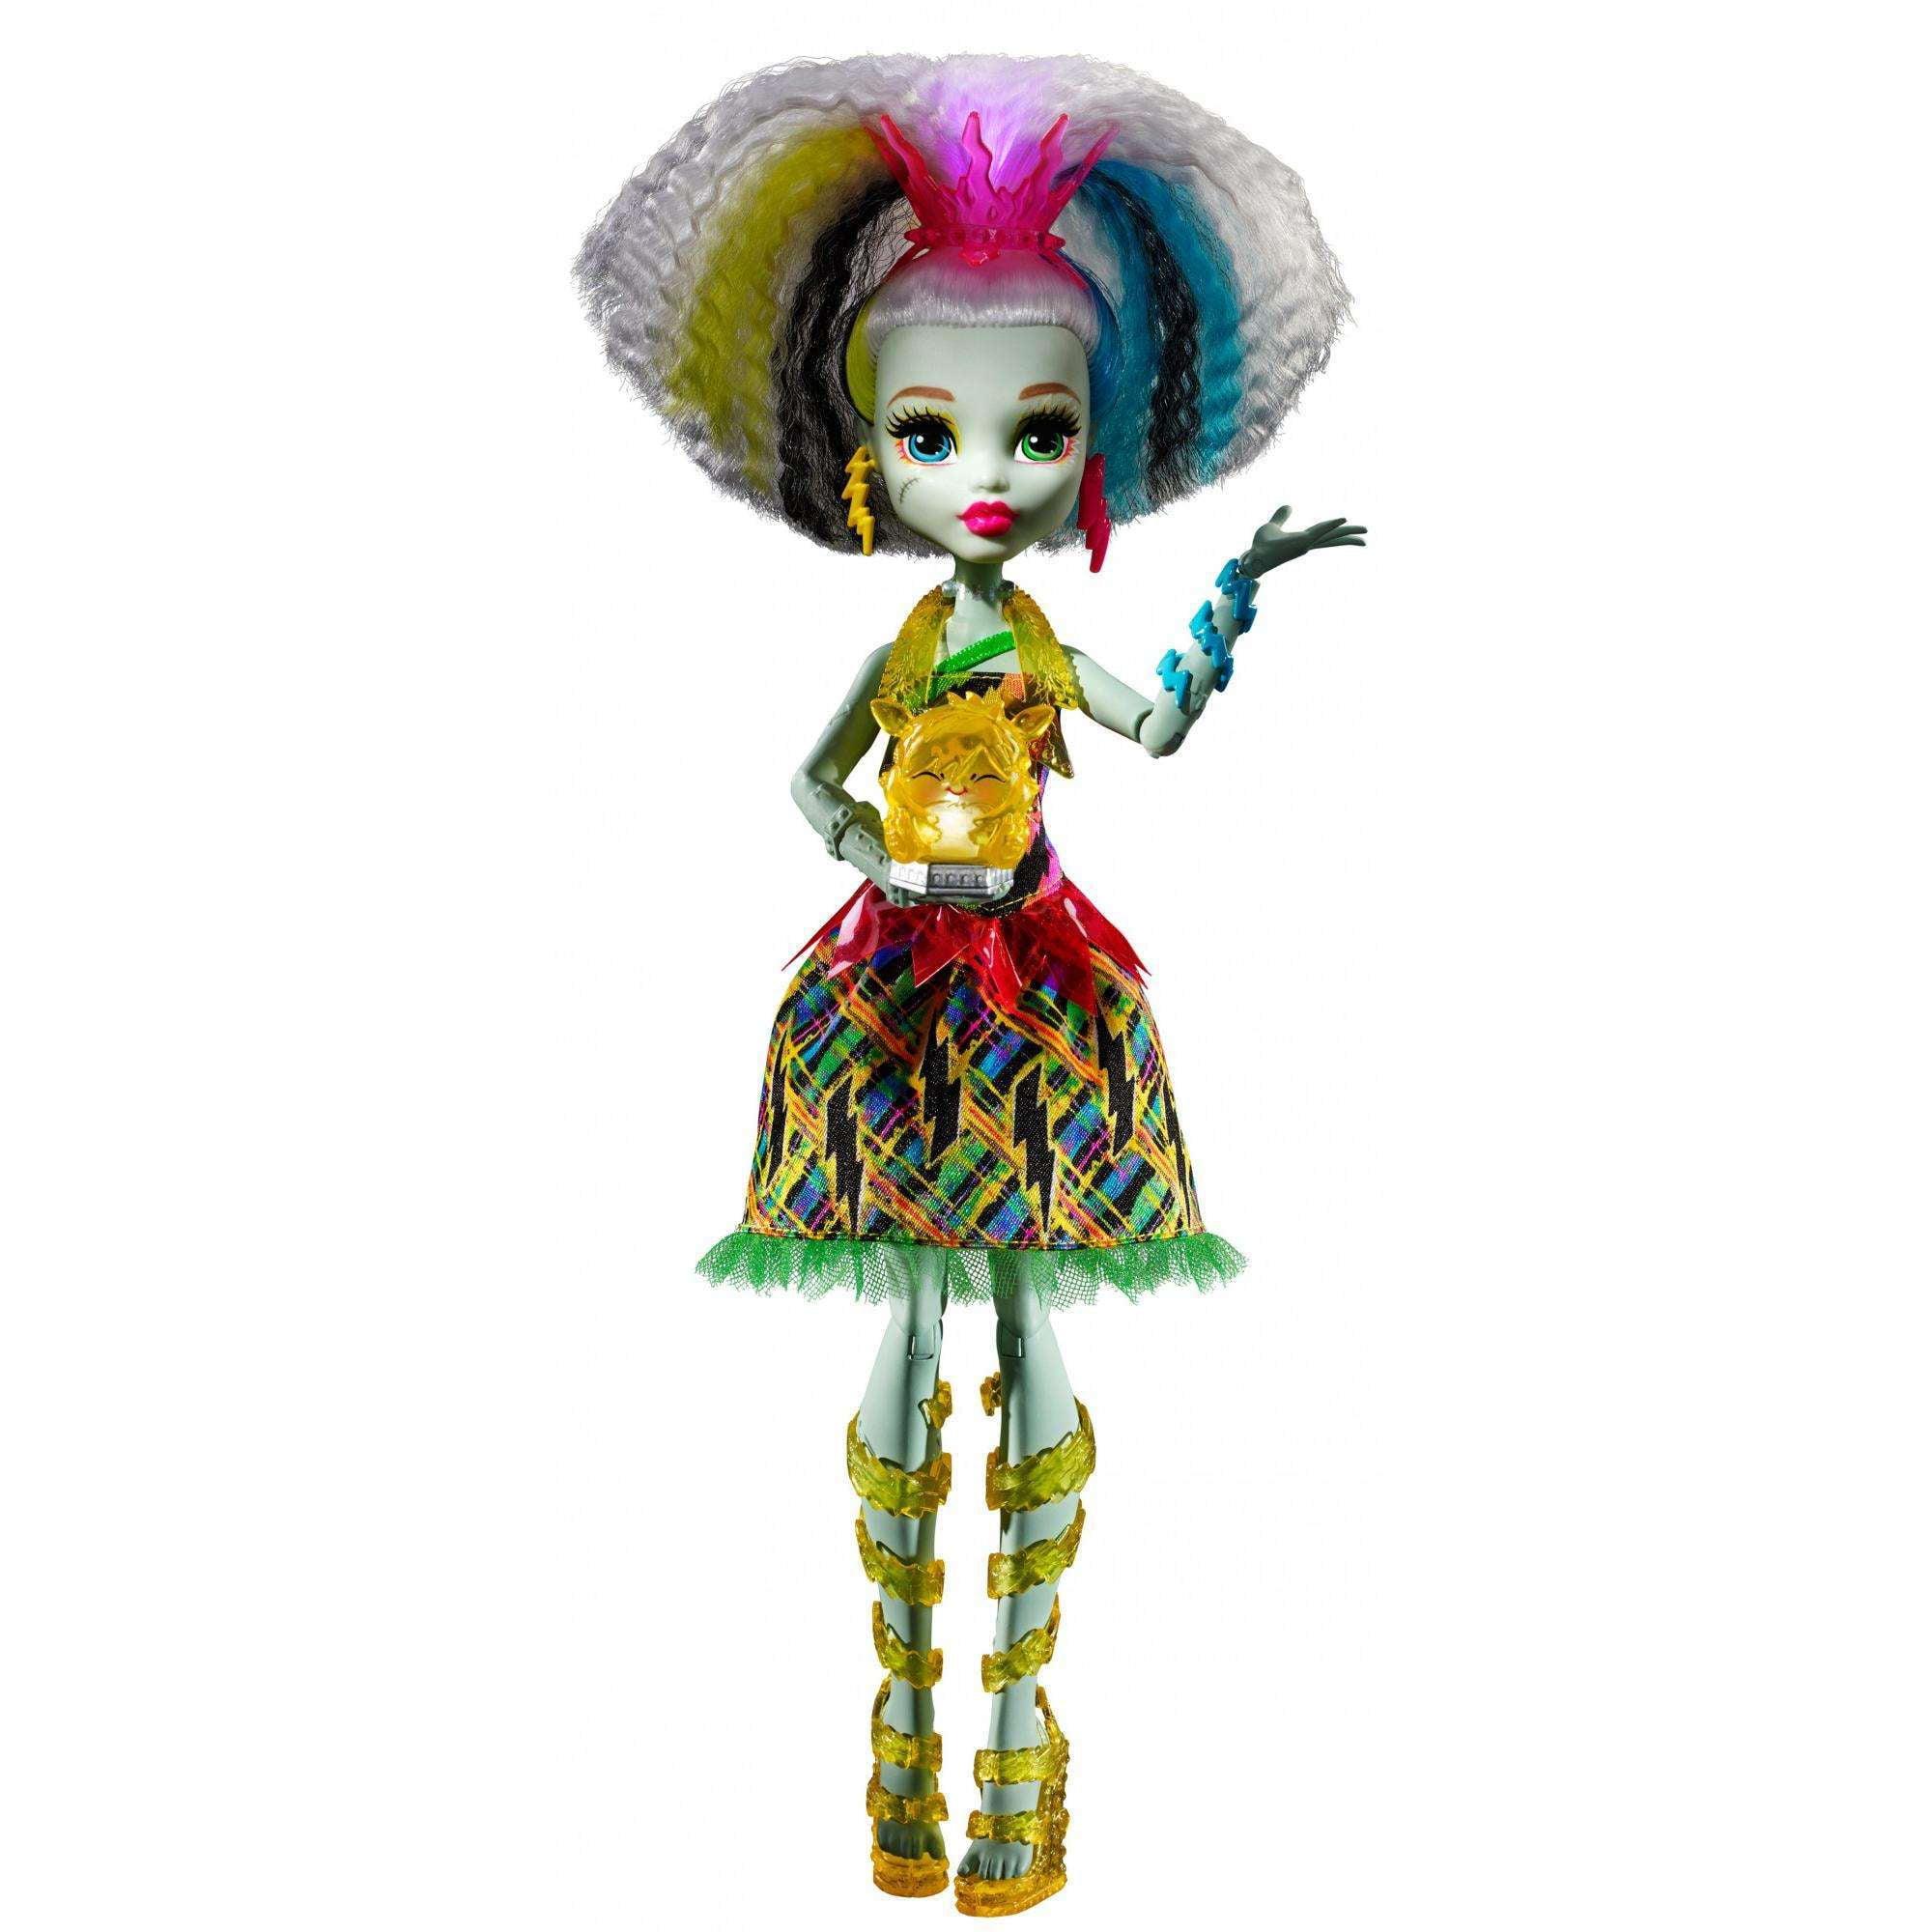 Monster High Electrified High Voltage Frankie Stein Doll by Mattel